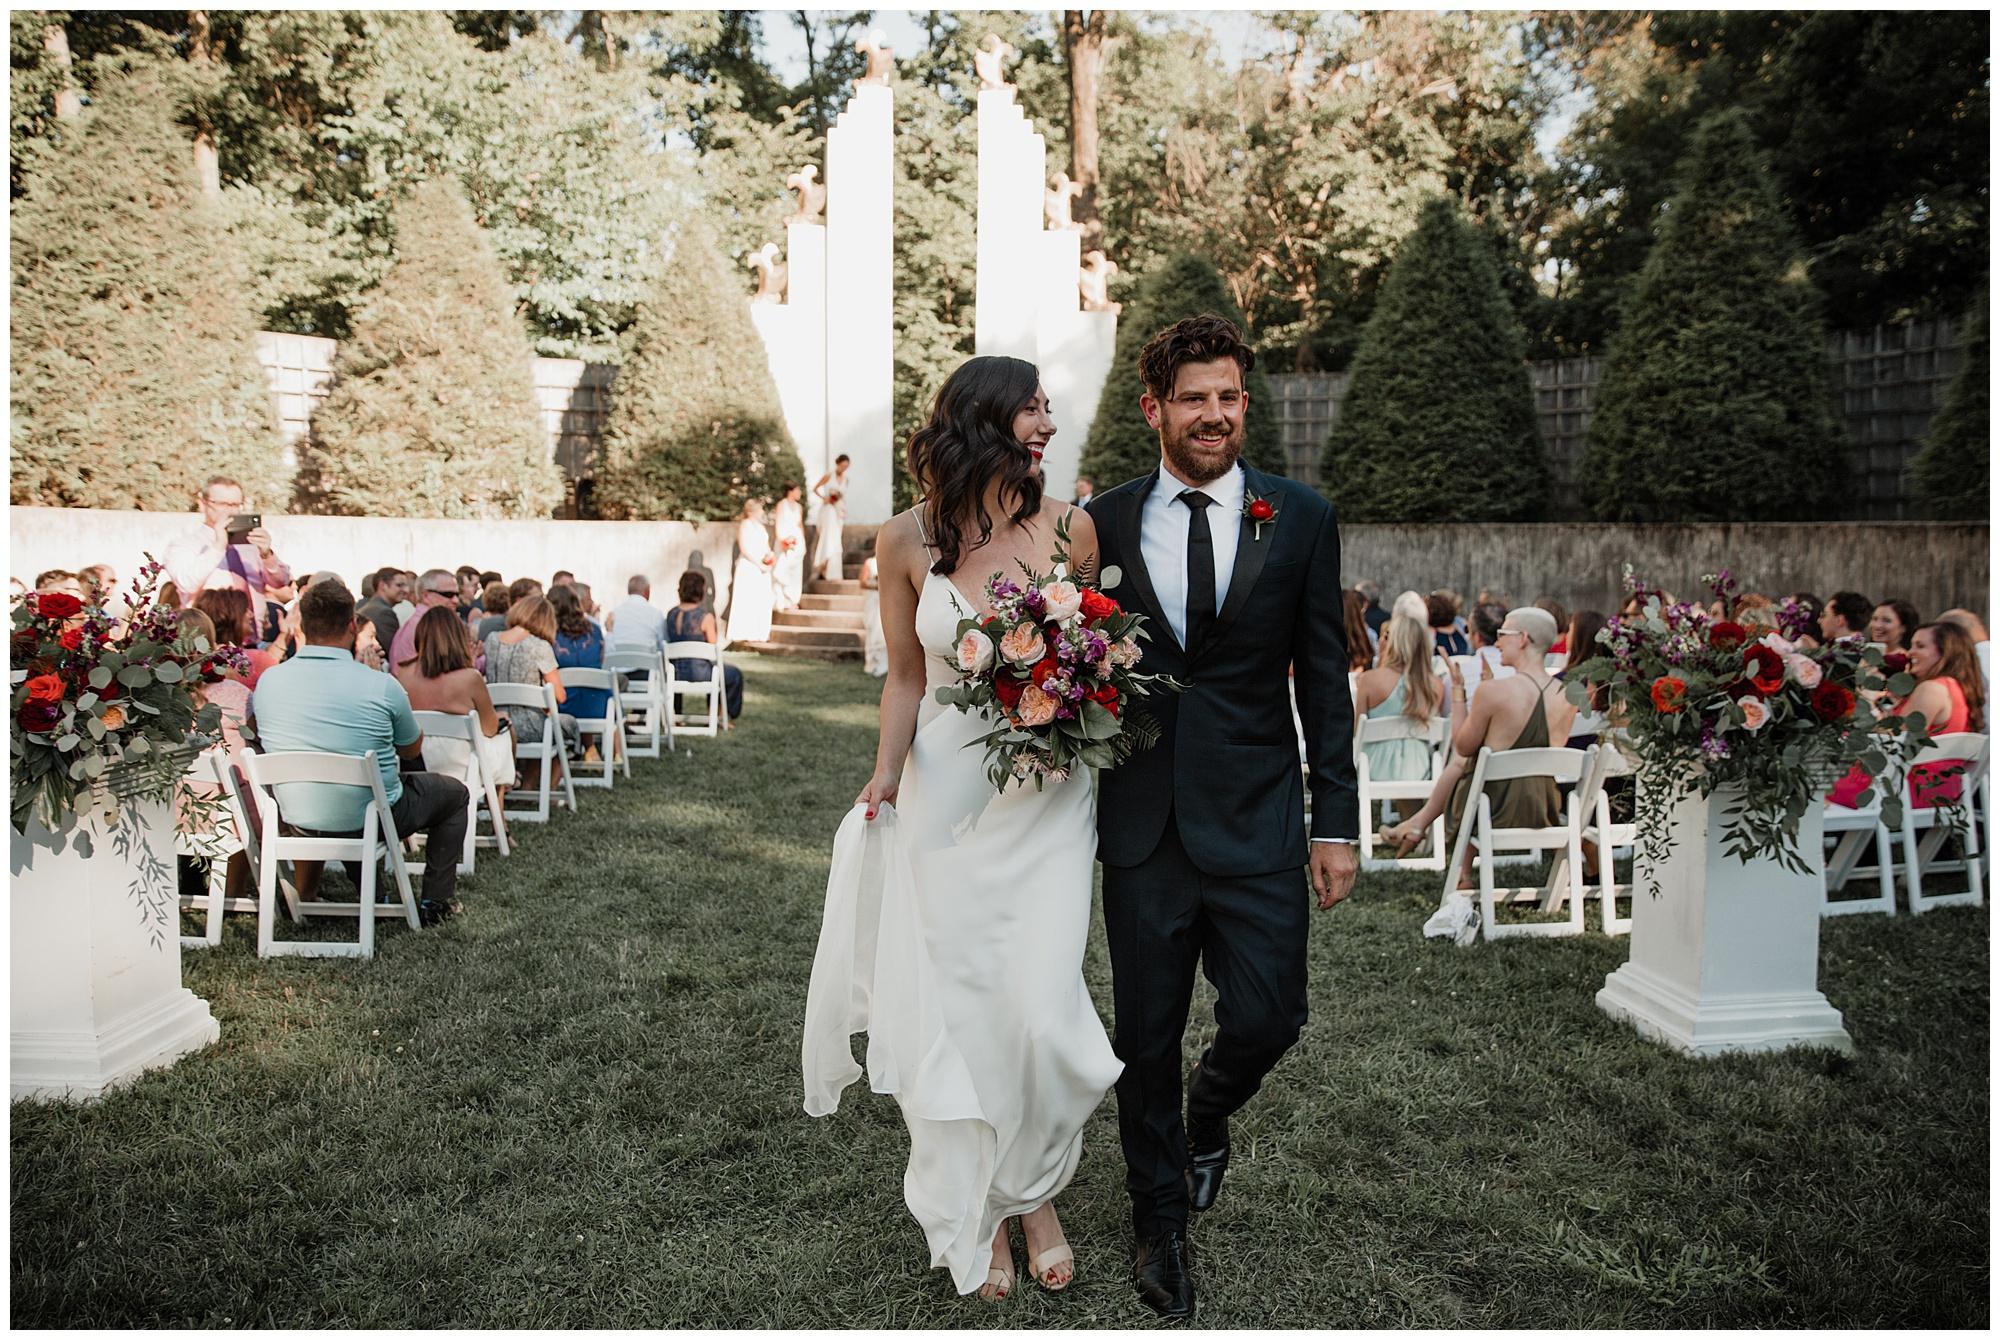 allerton_park_wedding_champaign_il_chicago_wright_photographs_ne_0090.jpg